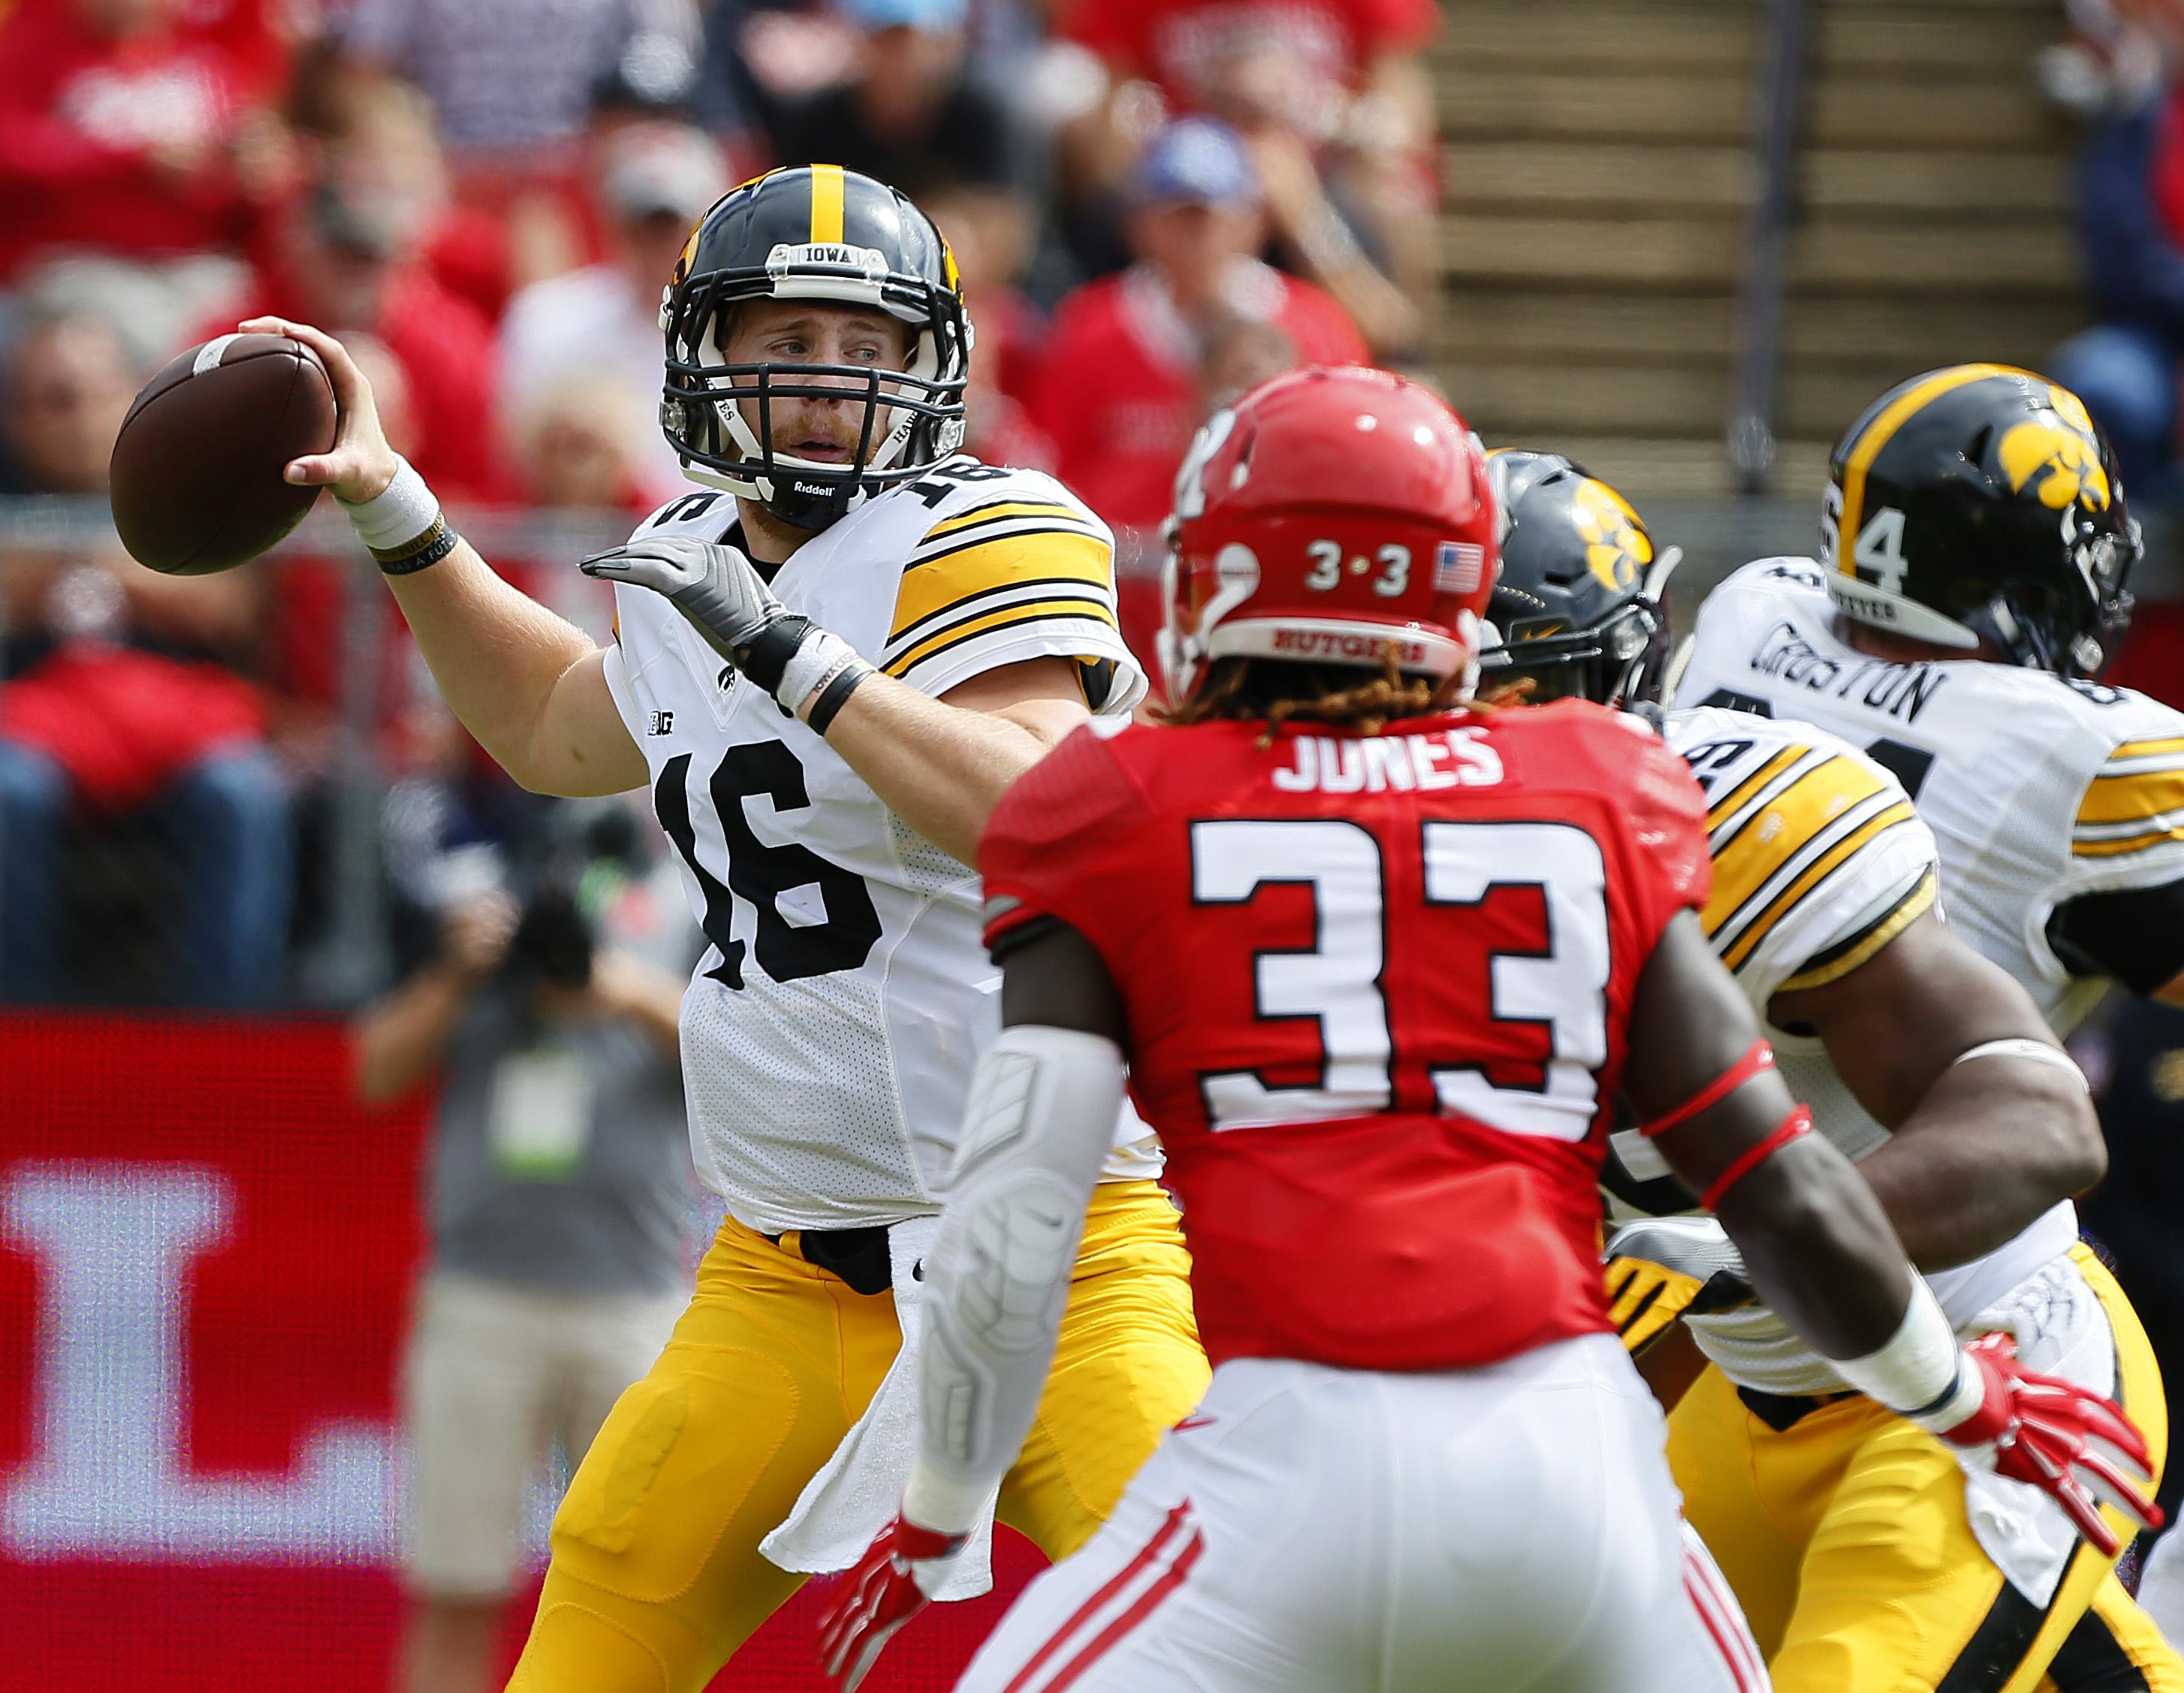 Iowa_rutgers_football